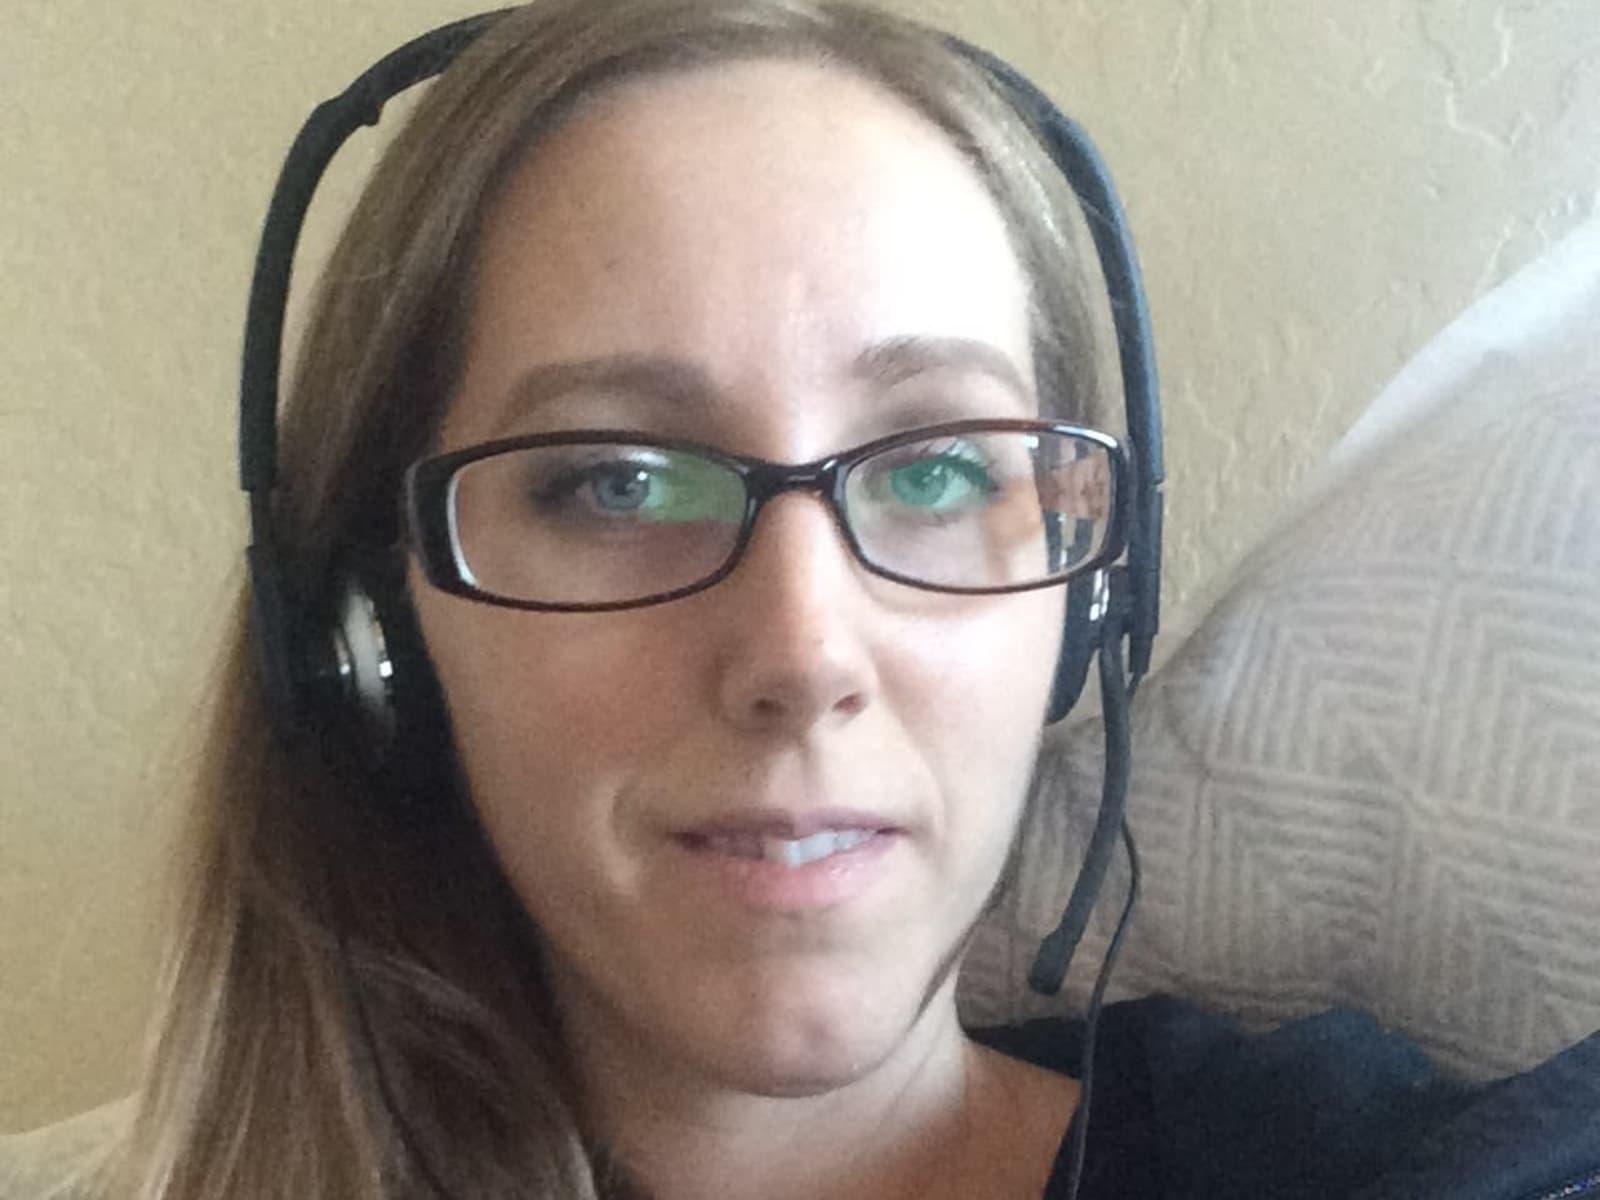 Cassandra from Phoenix, Arizona, United States